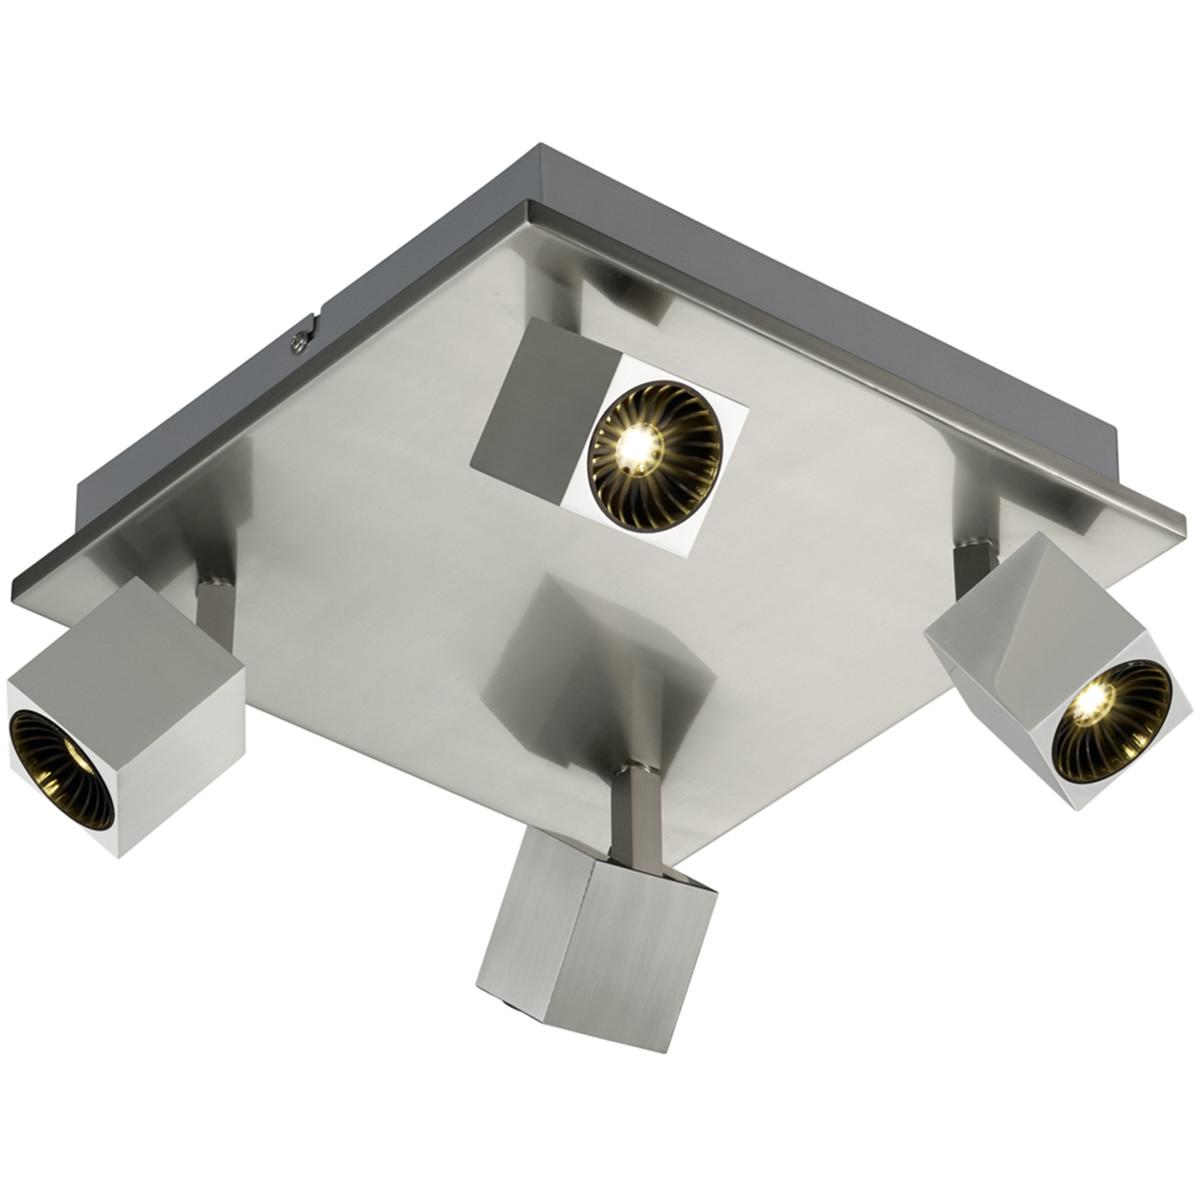 OSRAM - LED Plafondspot - Trion Klipo - 24W - Warm Wit 3000K - 4-lichts - Vierkant - Mat Nikkel - Al